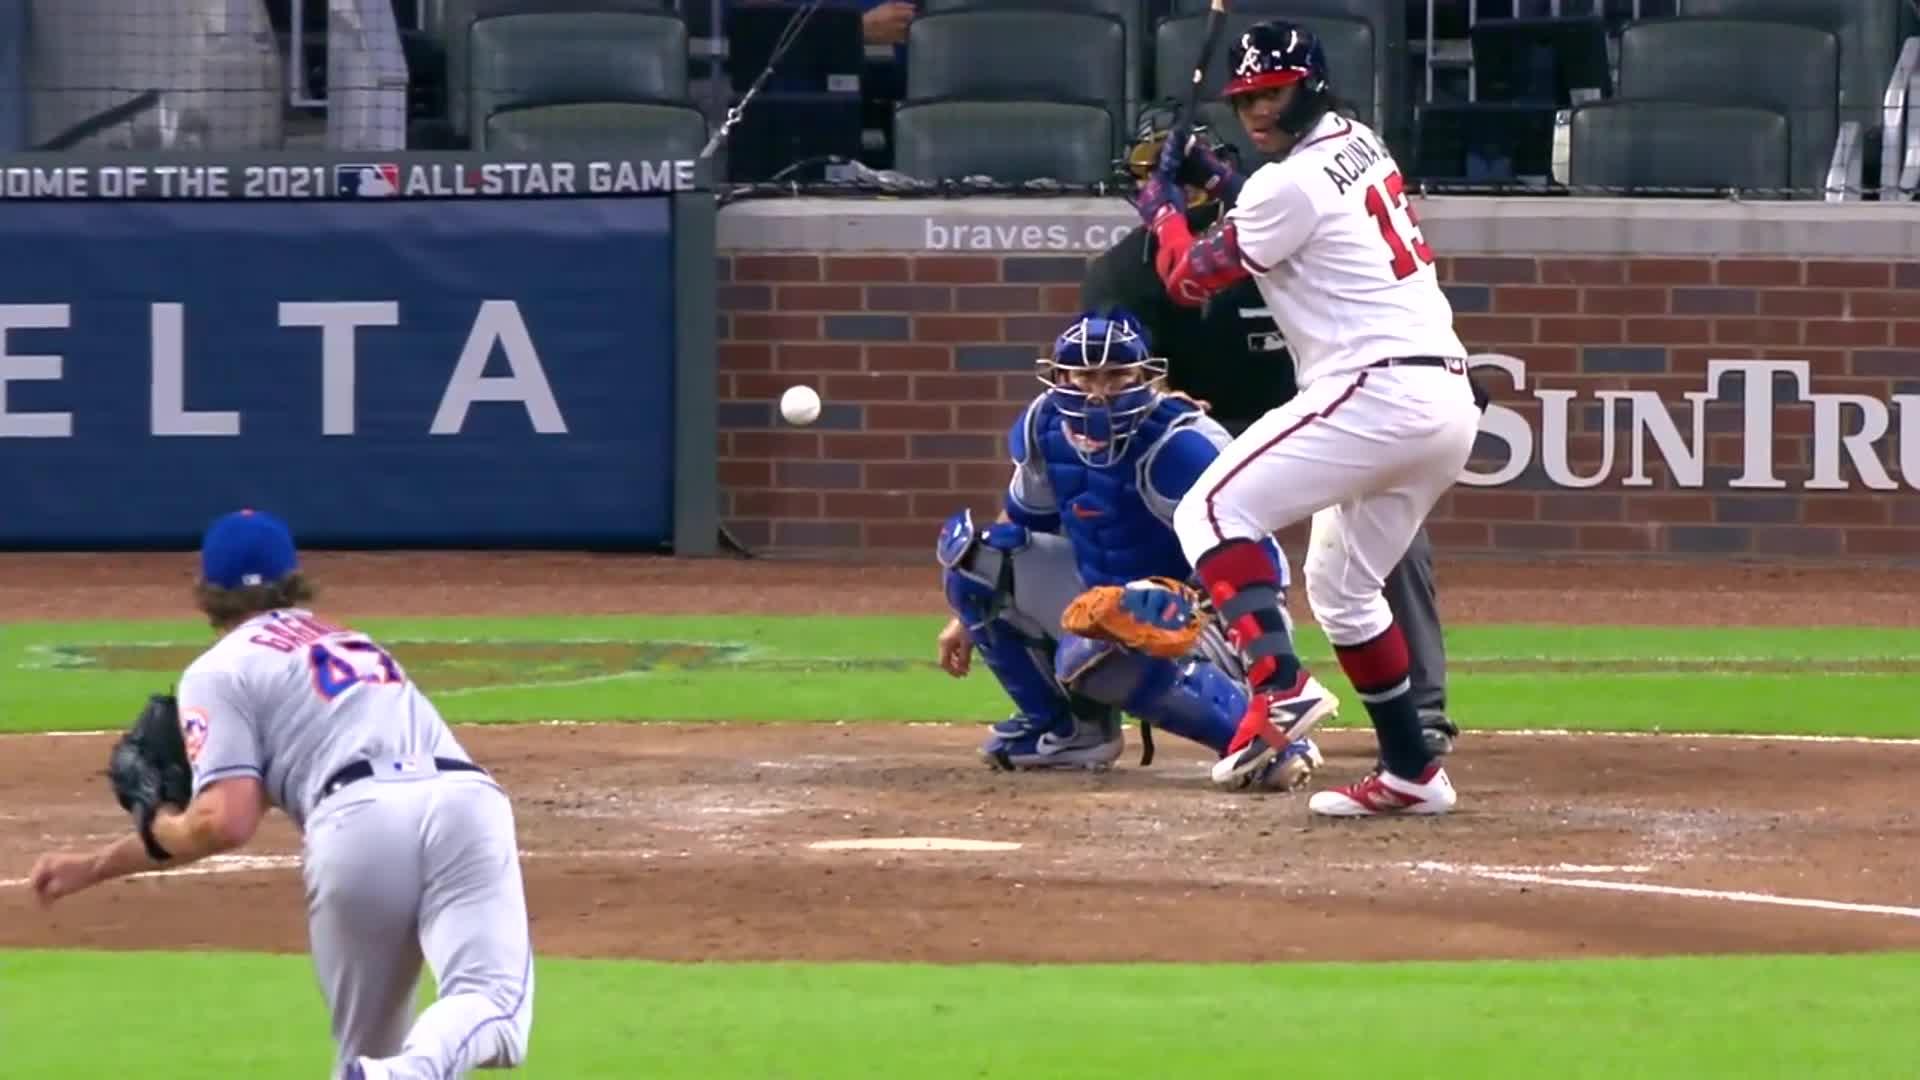 atlanta, atlanta braves, baseball, braves, home run, Ronald Acuña Jr. admires his 35th home run as it leaves the park. GIFs